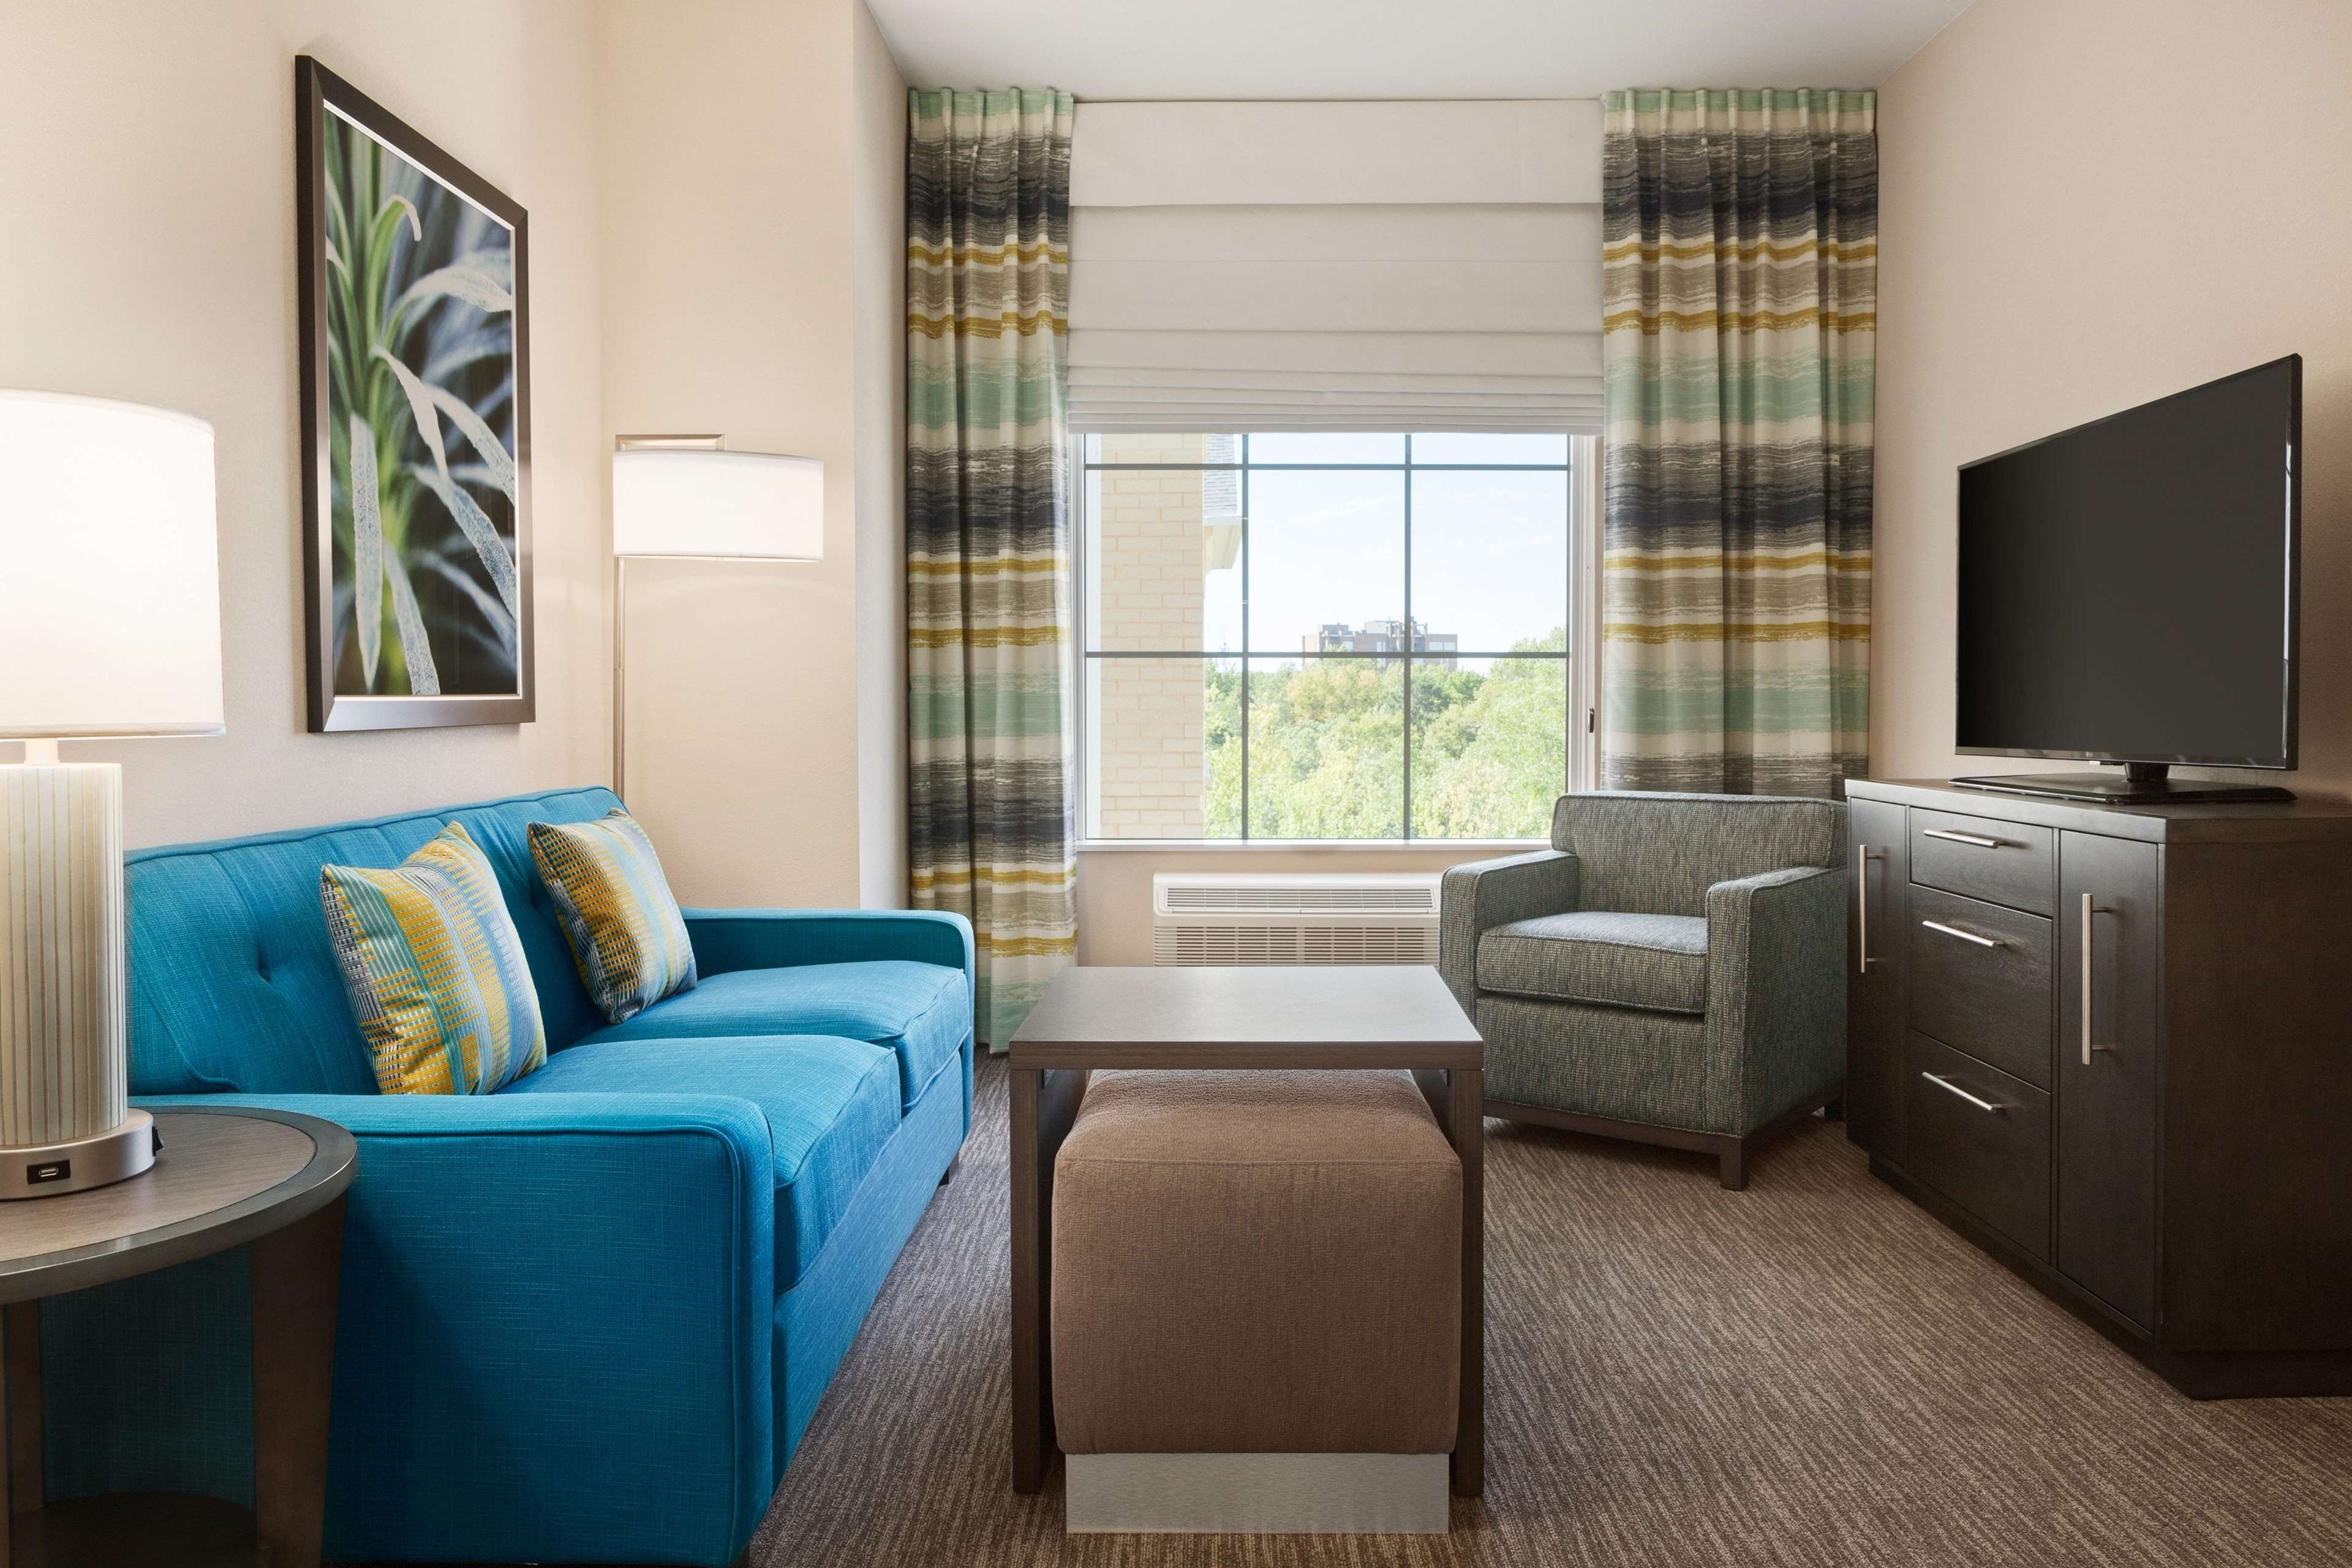 Homewood Suites by Hilton Charlotte/SouthPark image 20